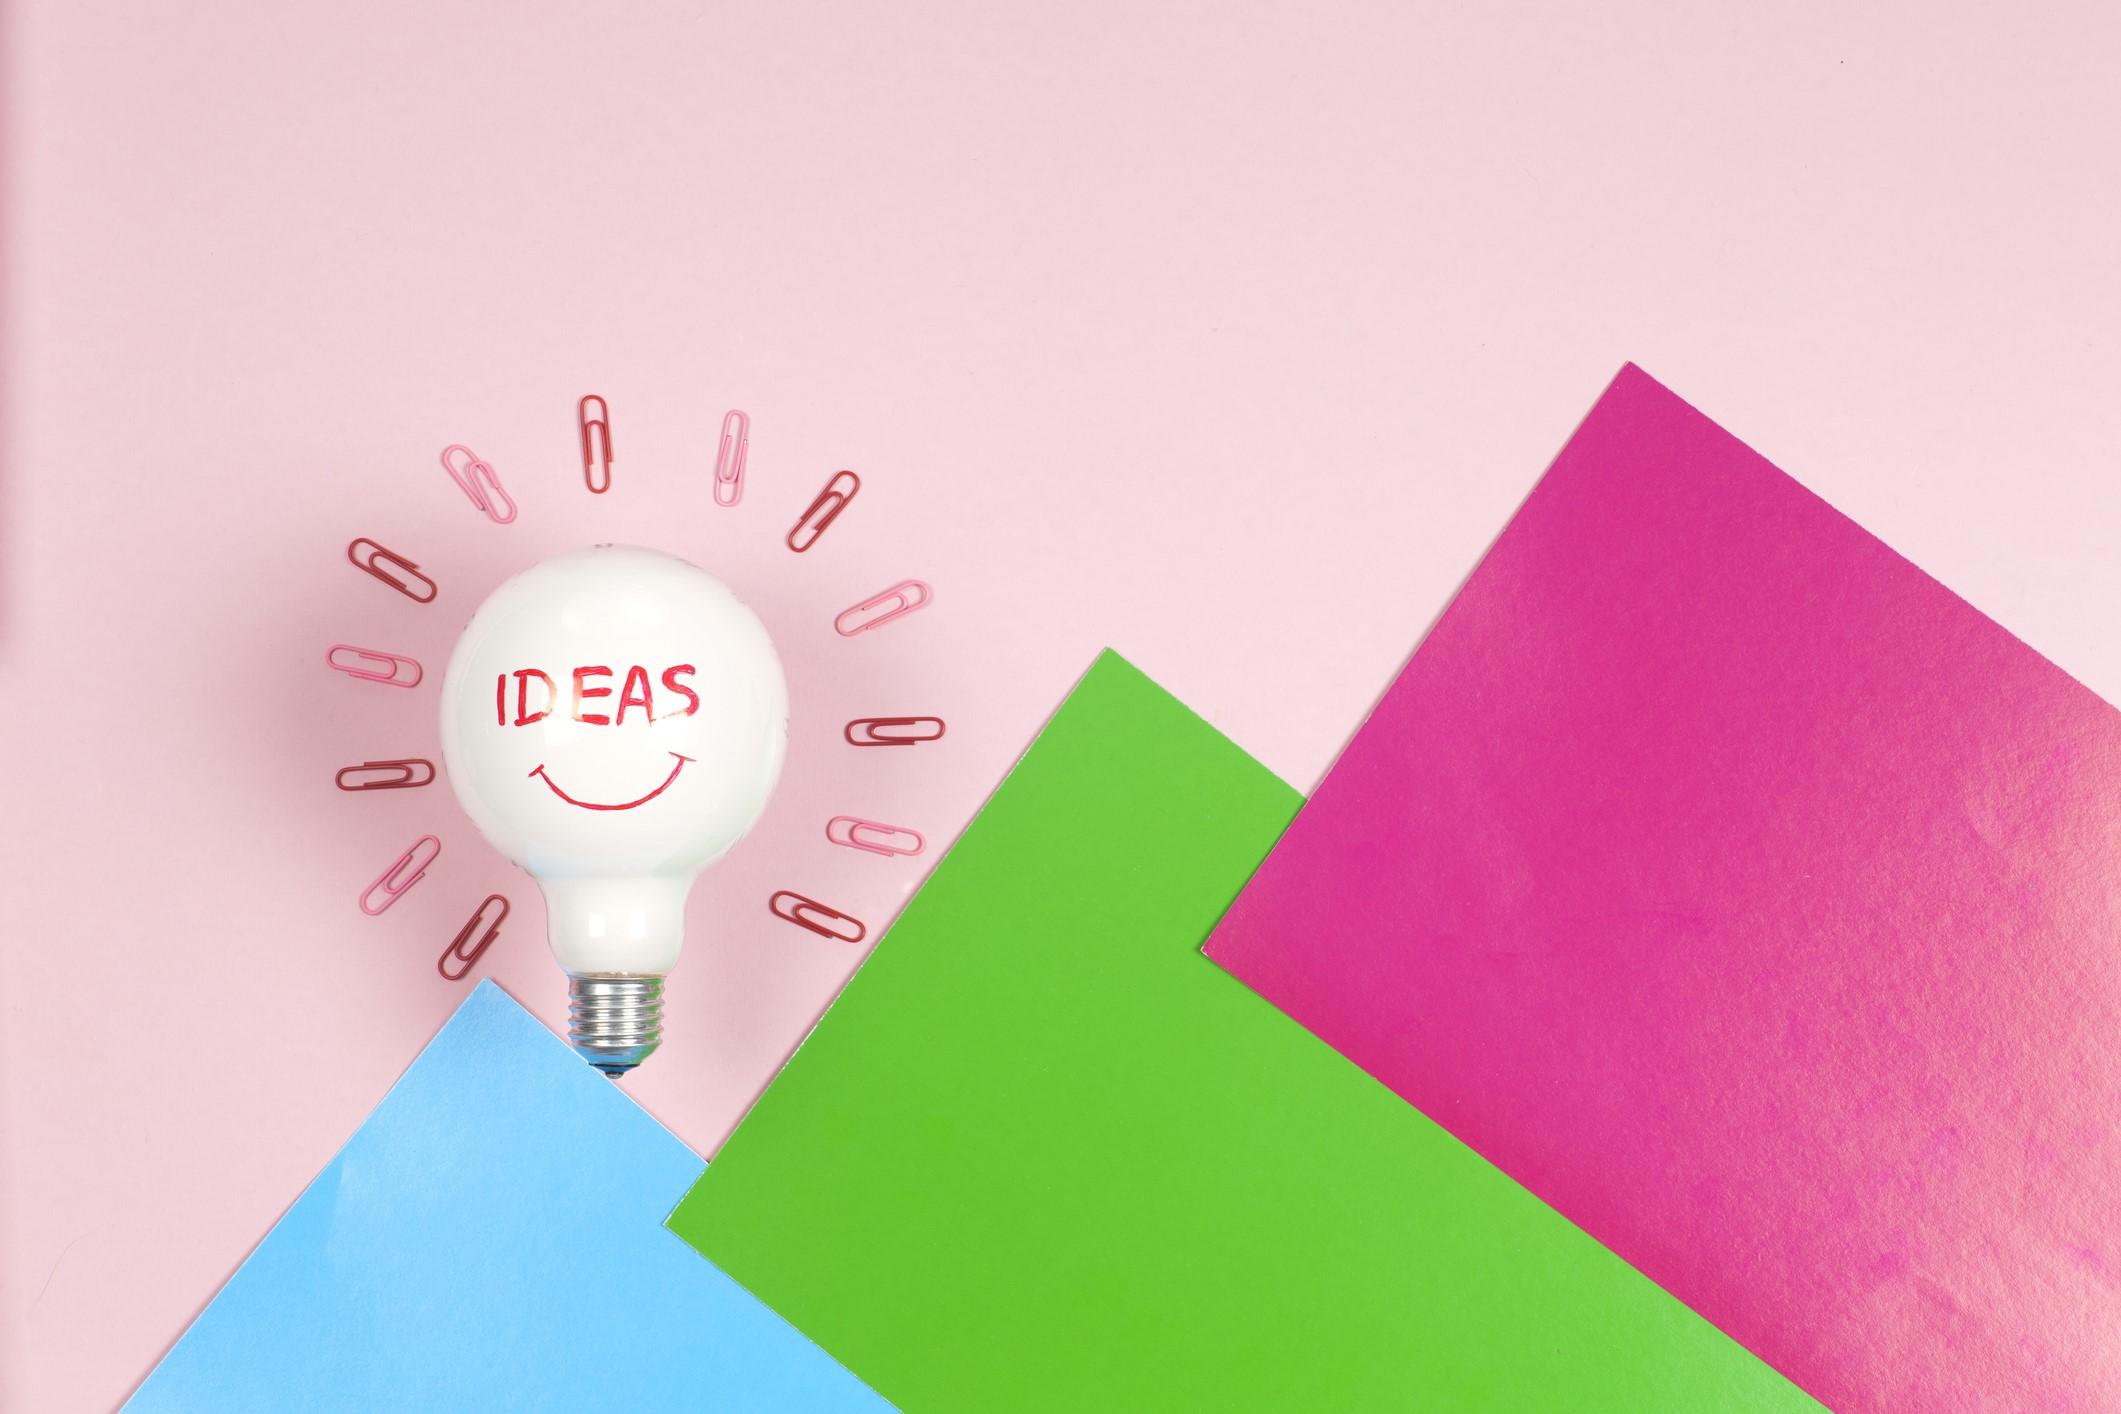 Creative brainstorm concept business idea, innovation and solution, creative design.